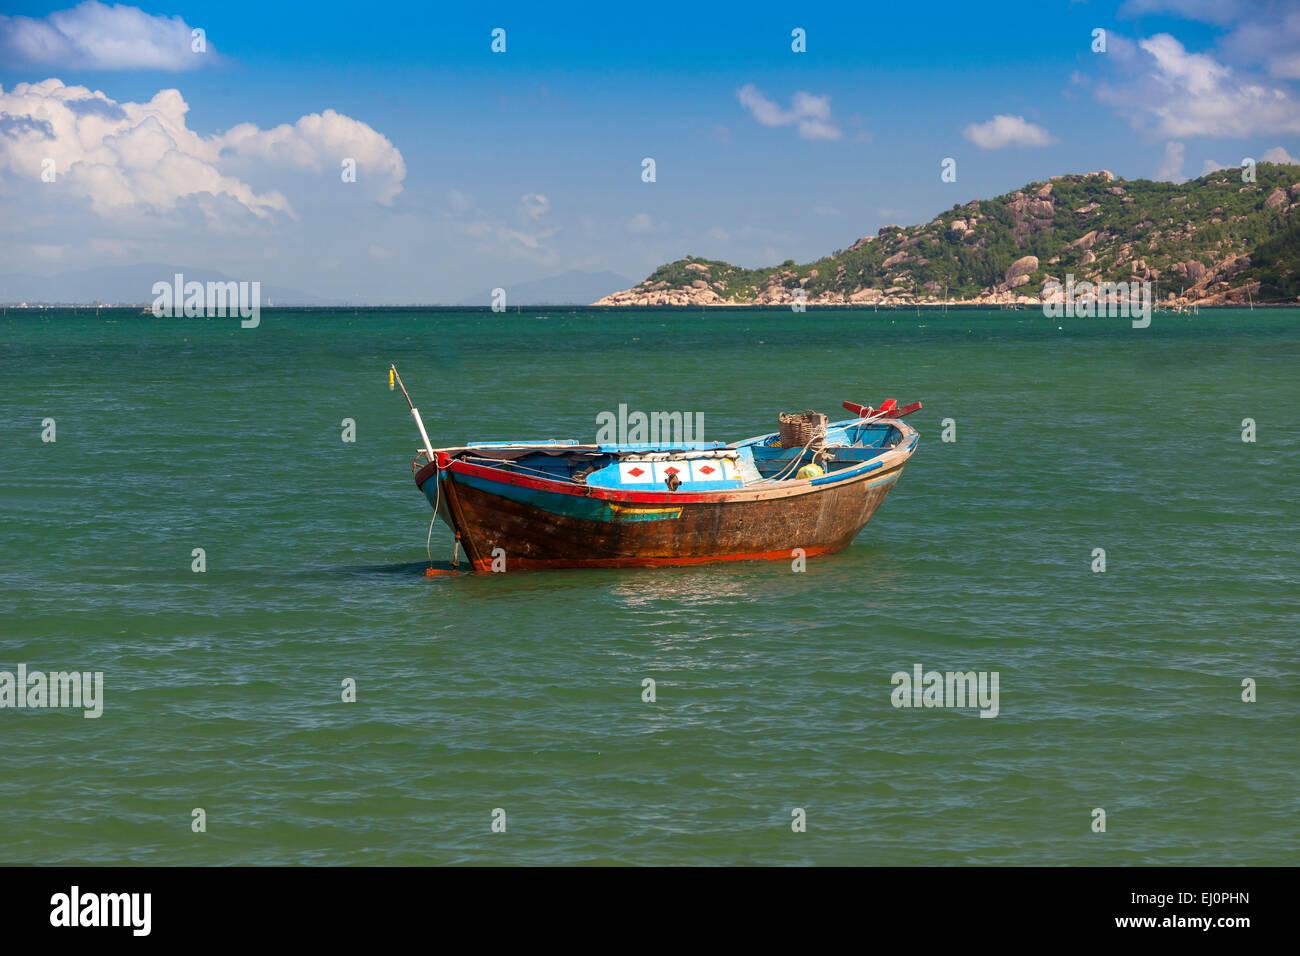 Fishing boat, Hon, Mun, bay, Vinpearl, island, South China Sea, sea, Asian, Asia, outside, mountains, mountainous, - Stock Image